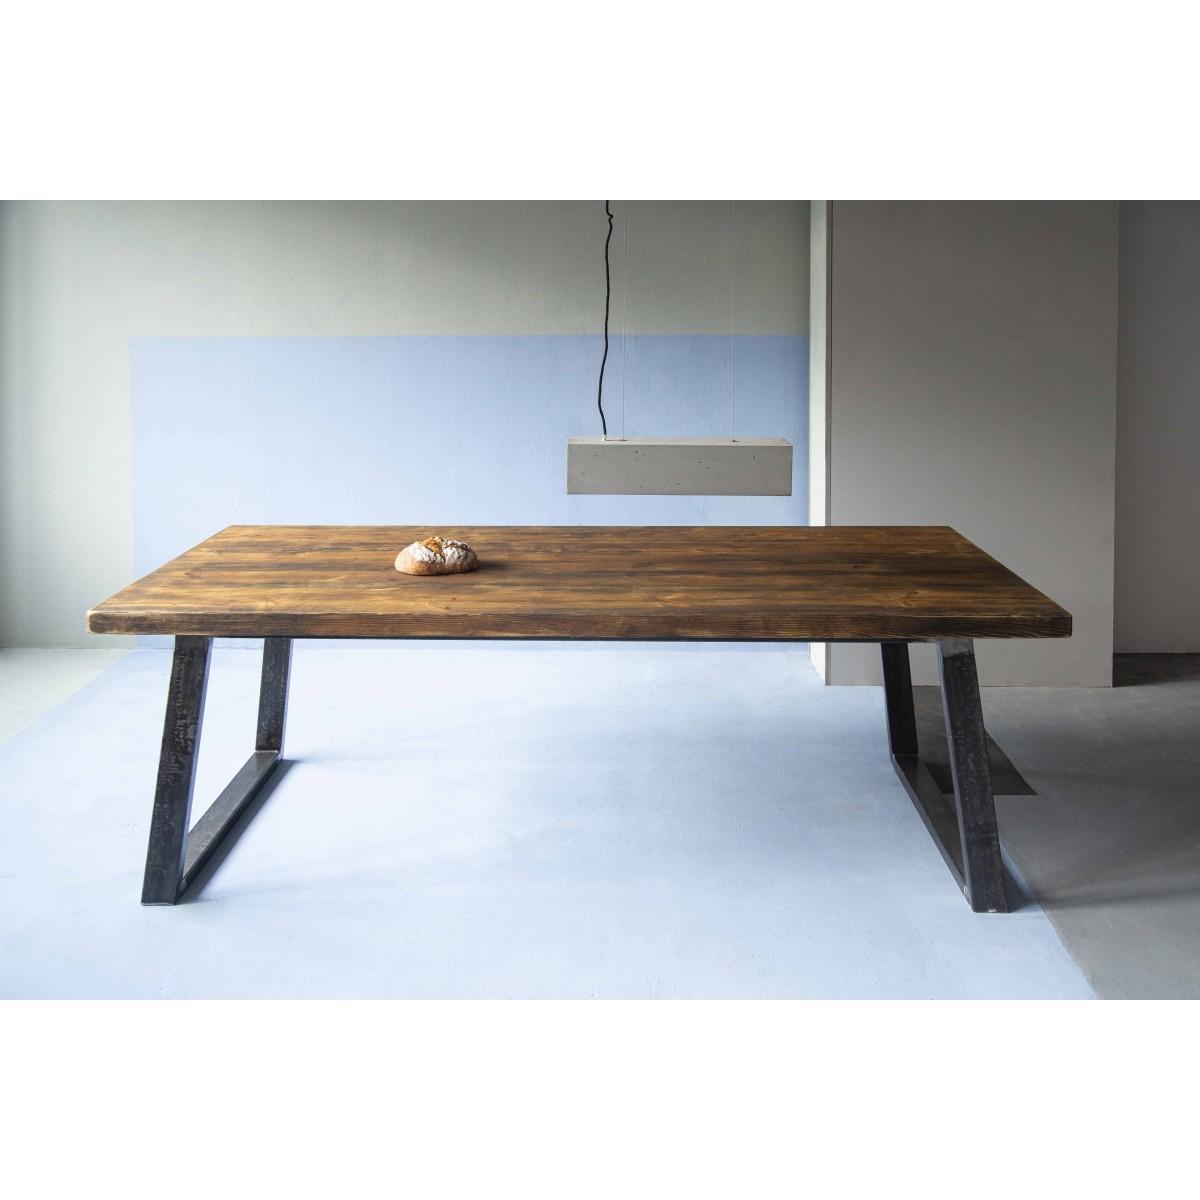 FraaiBerlin – Lidet/Loren Rohstahl 220 x 100 cm mit zwei Ansteckplatten á 50cm